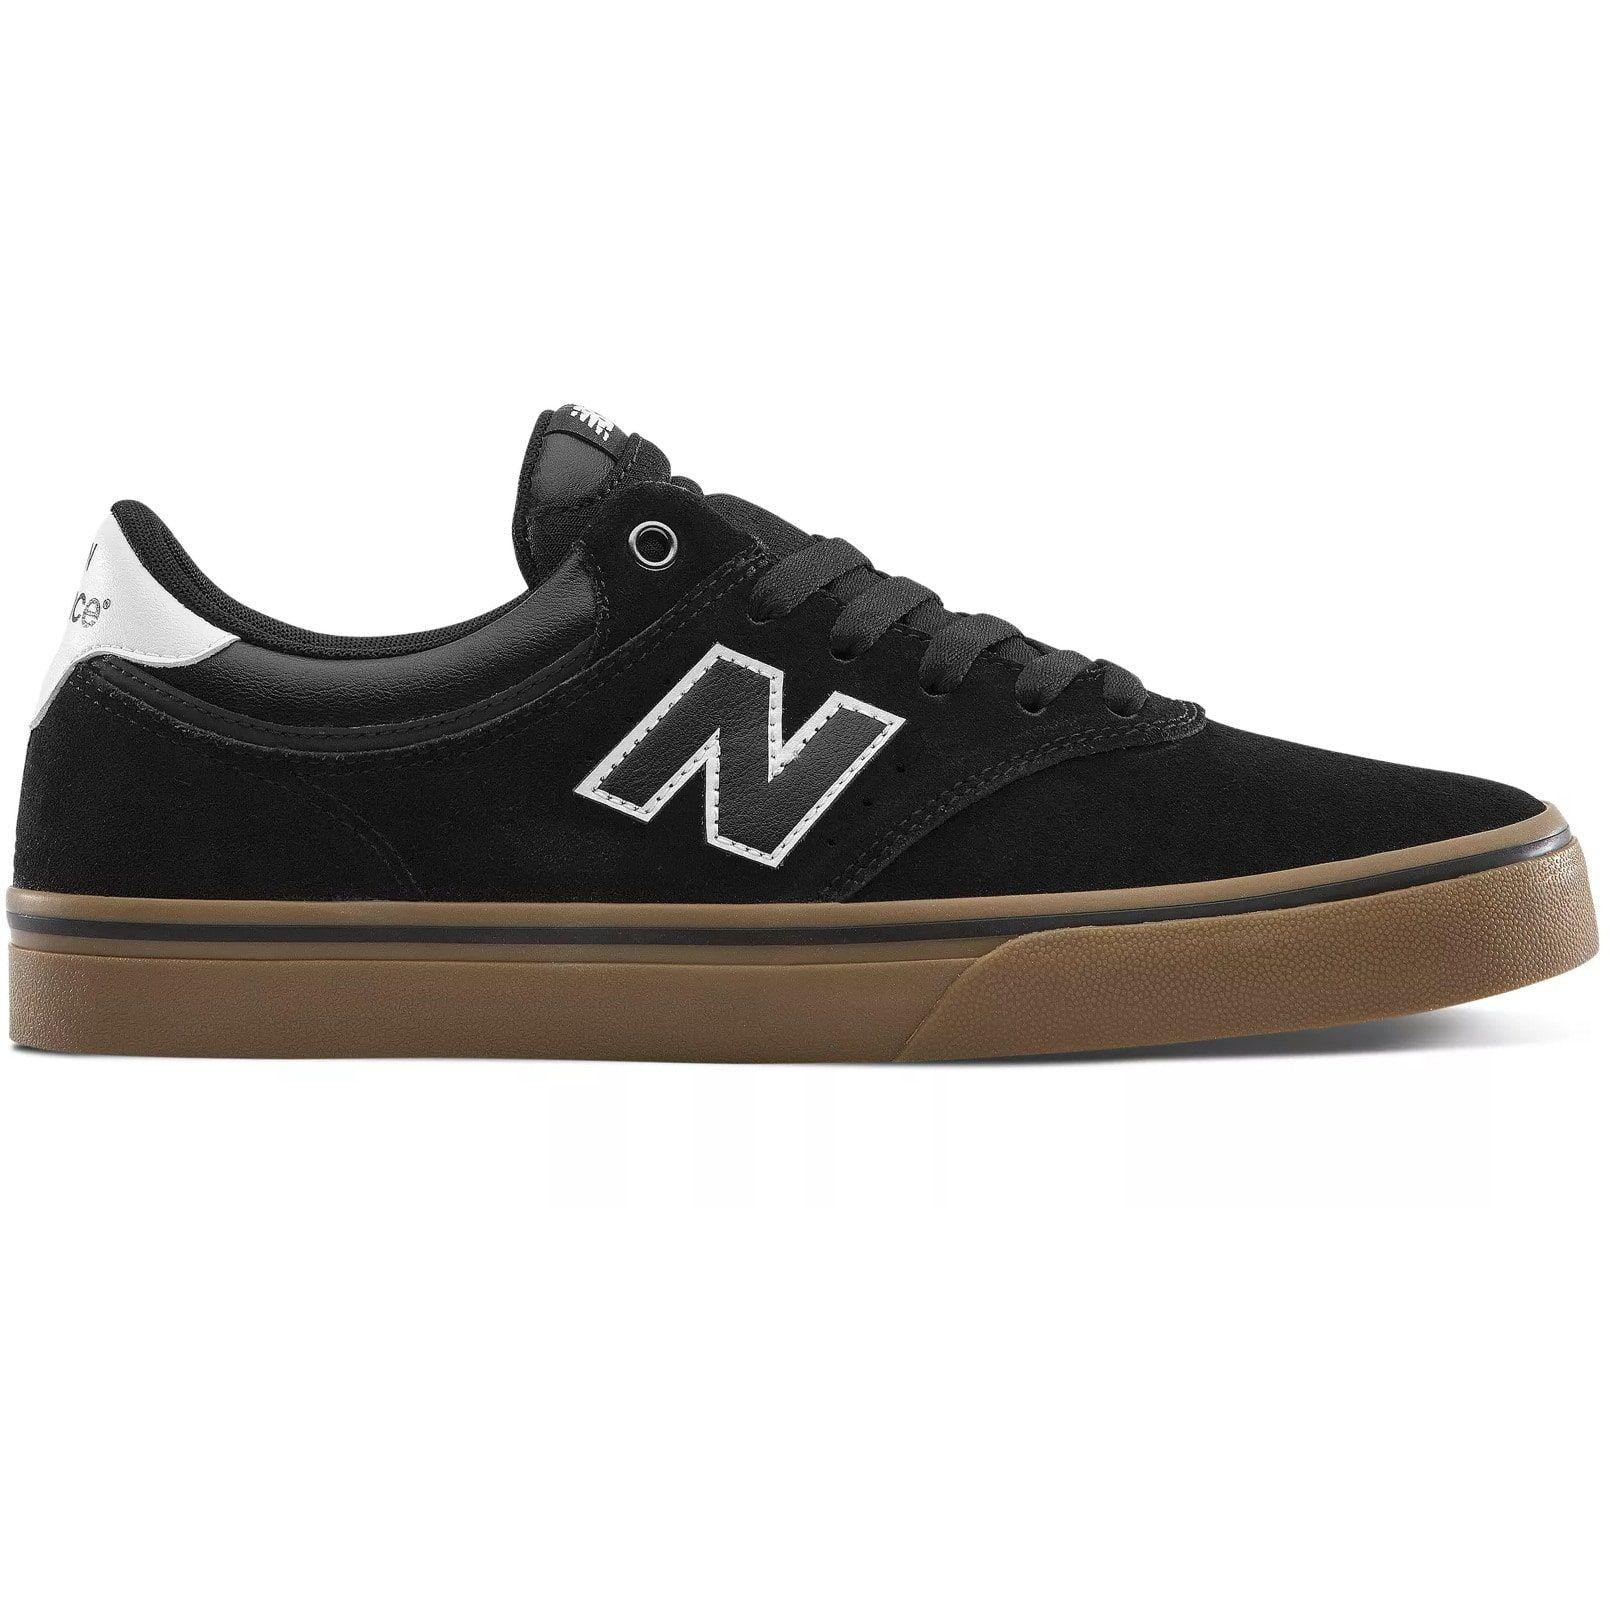 Buy New Balance 255 Skate Shoes - Black